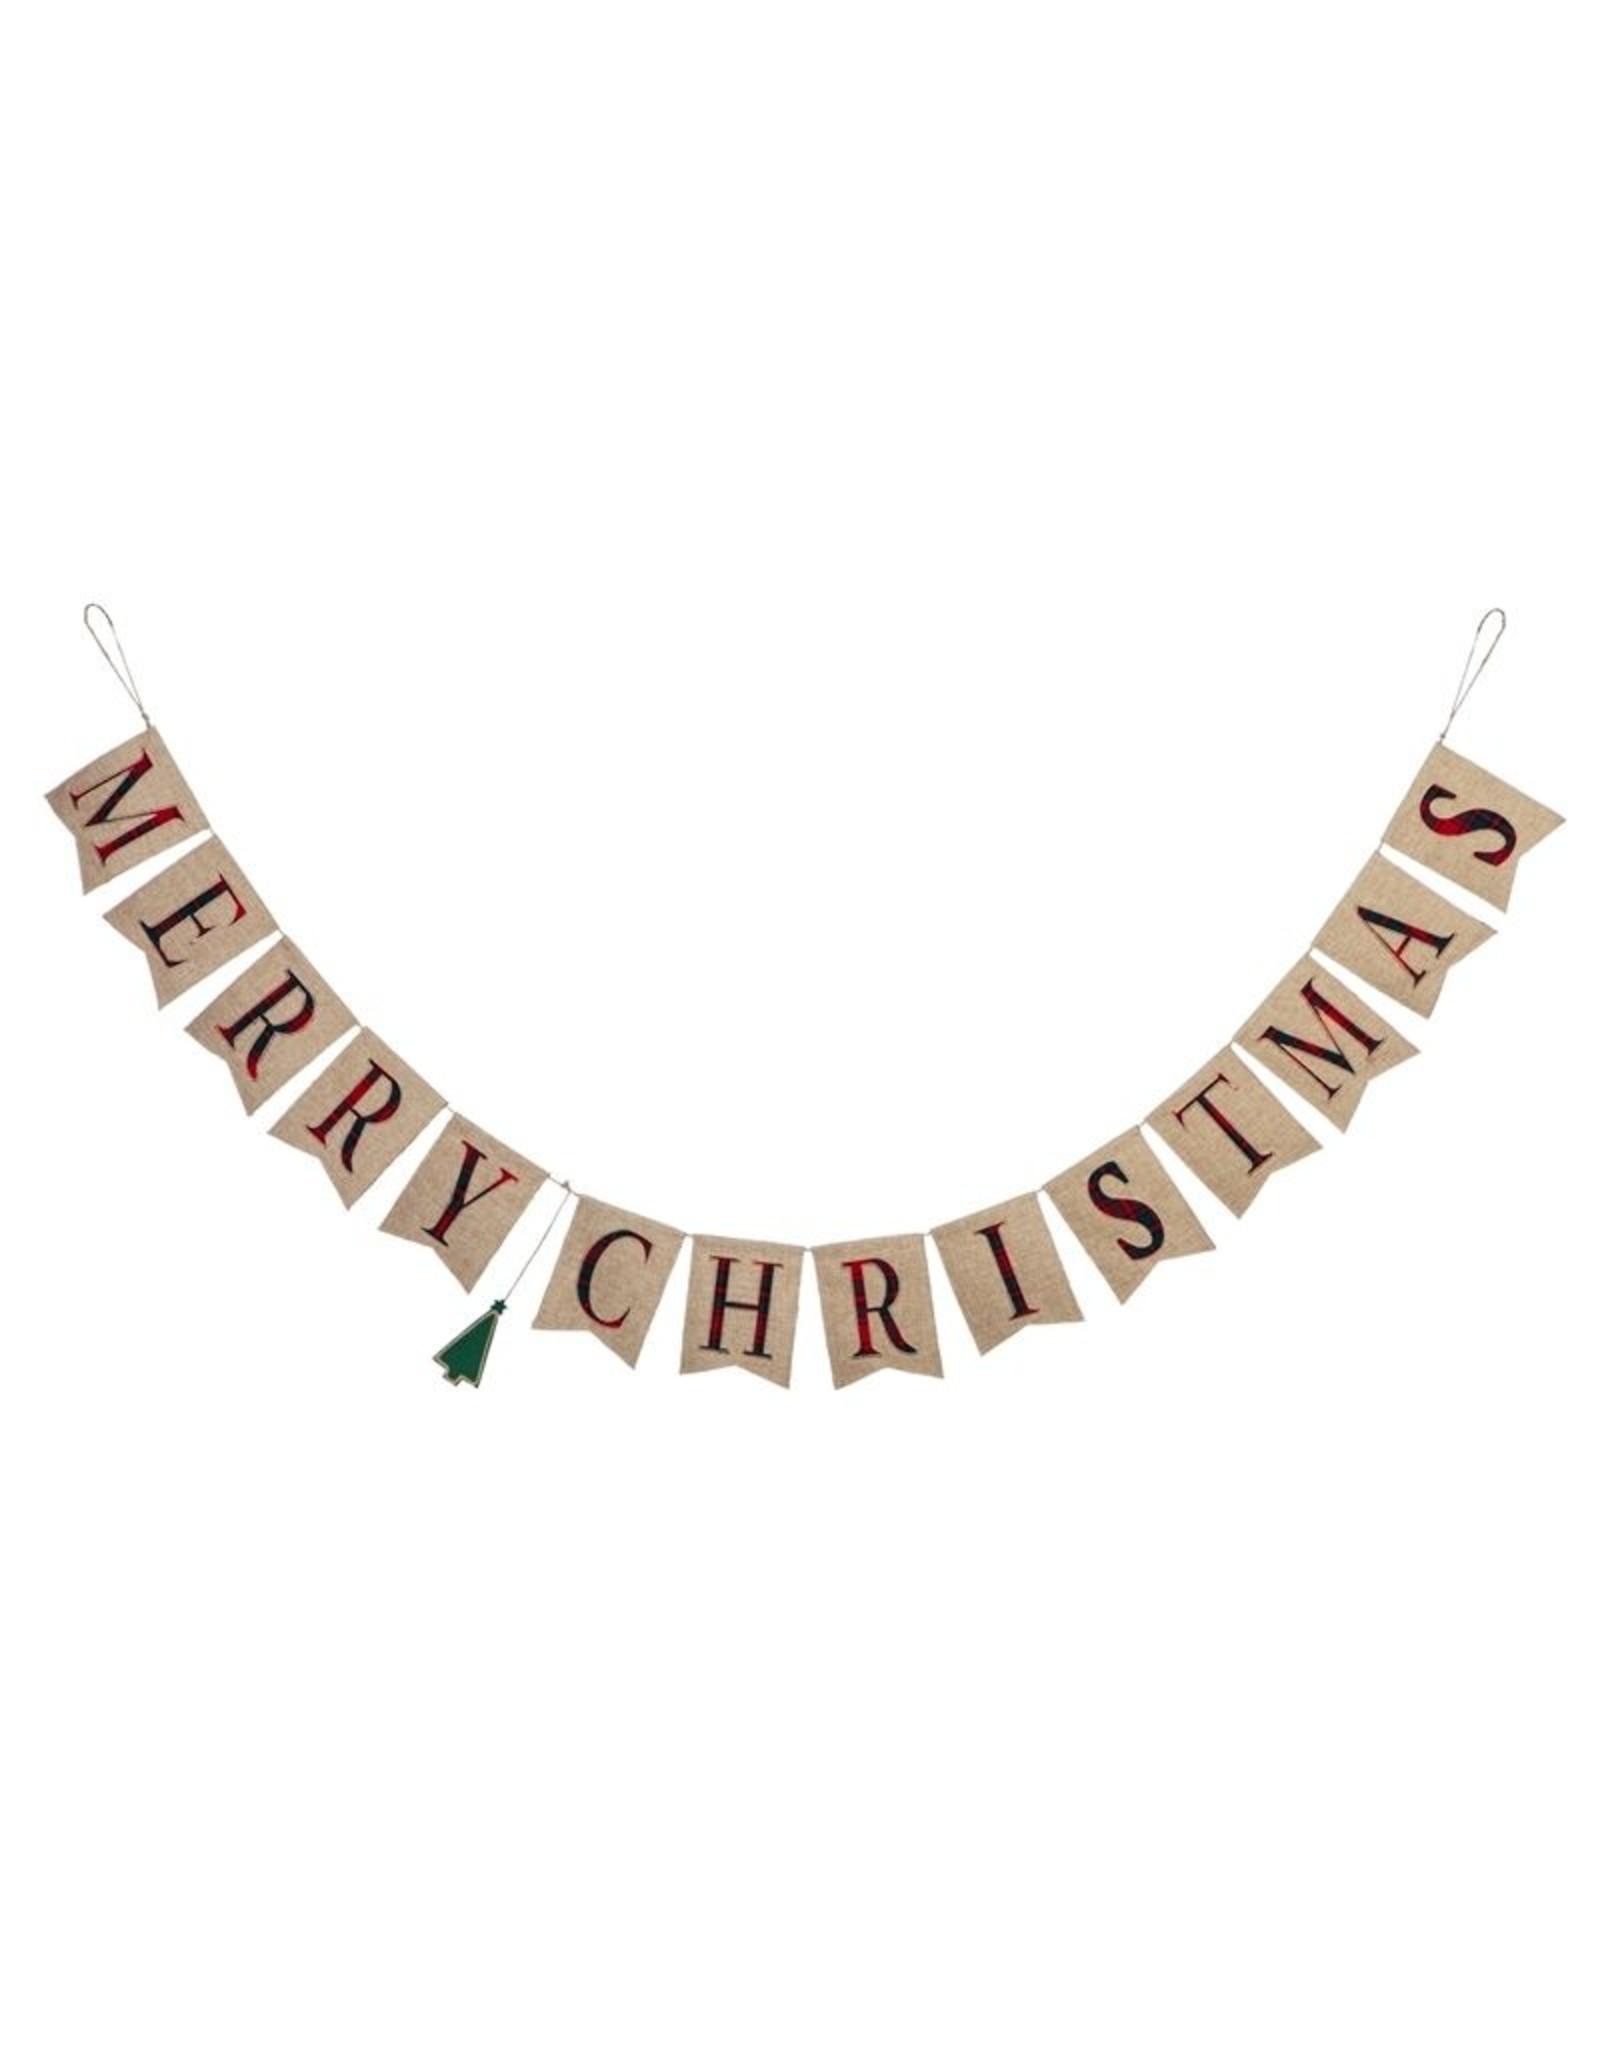 Evergreen Enterprises Merry Christmas Seasonal Decor Banner